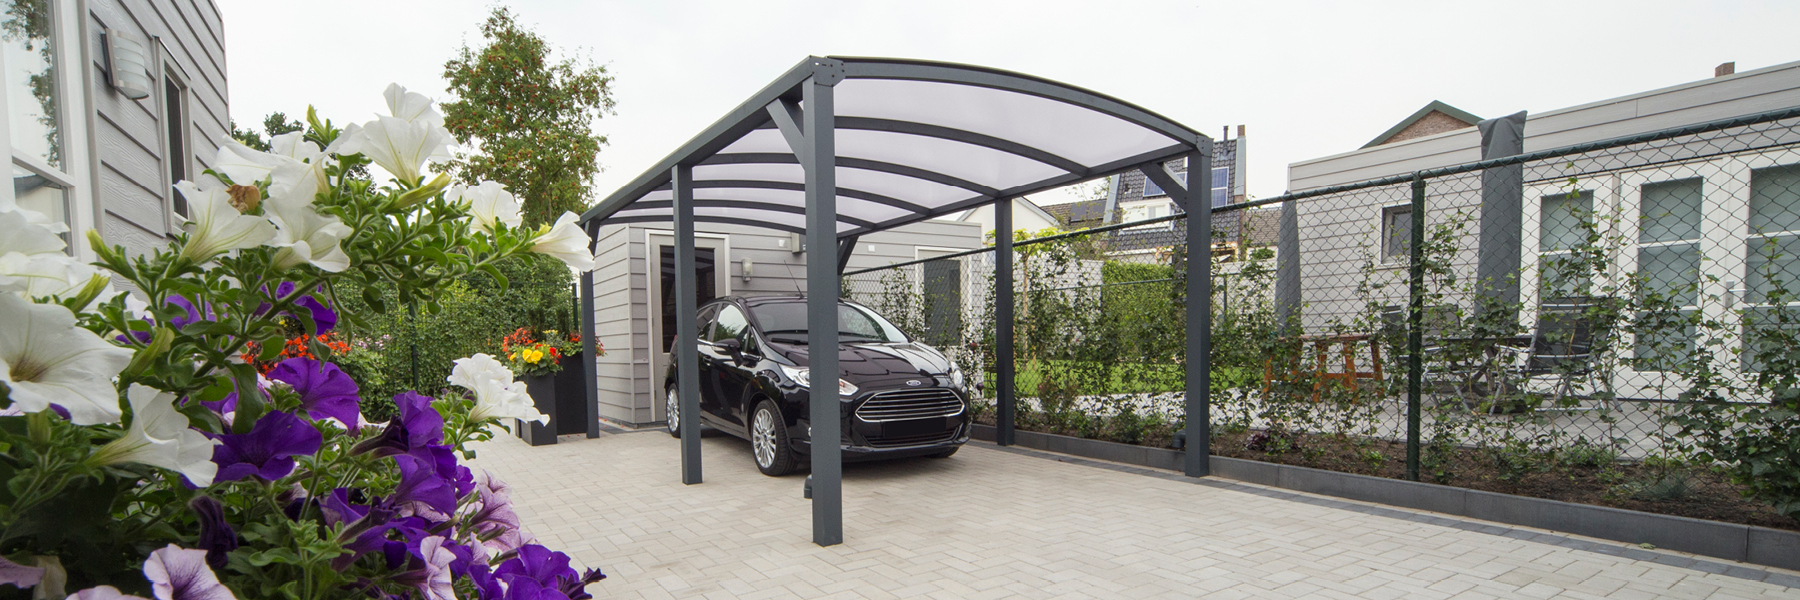 Frelu Buitengewoon | Carport